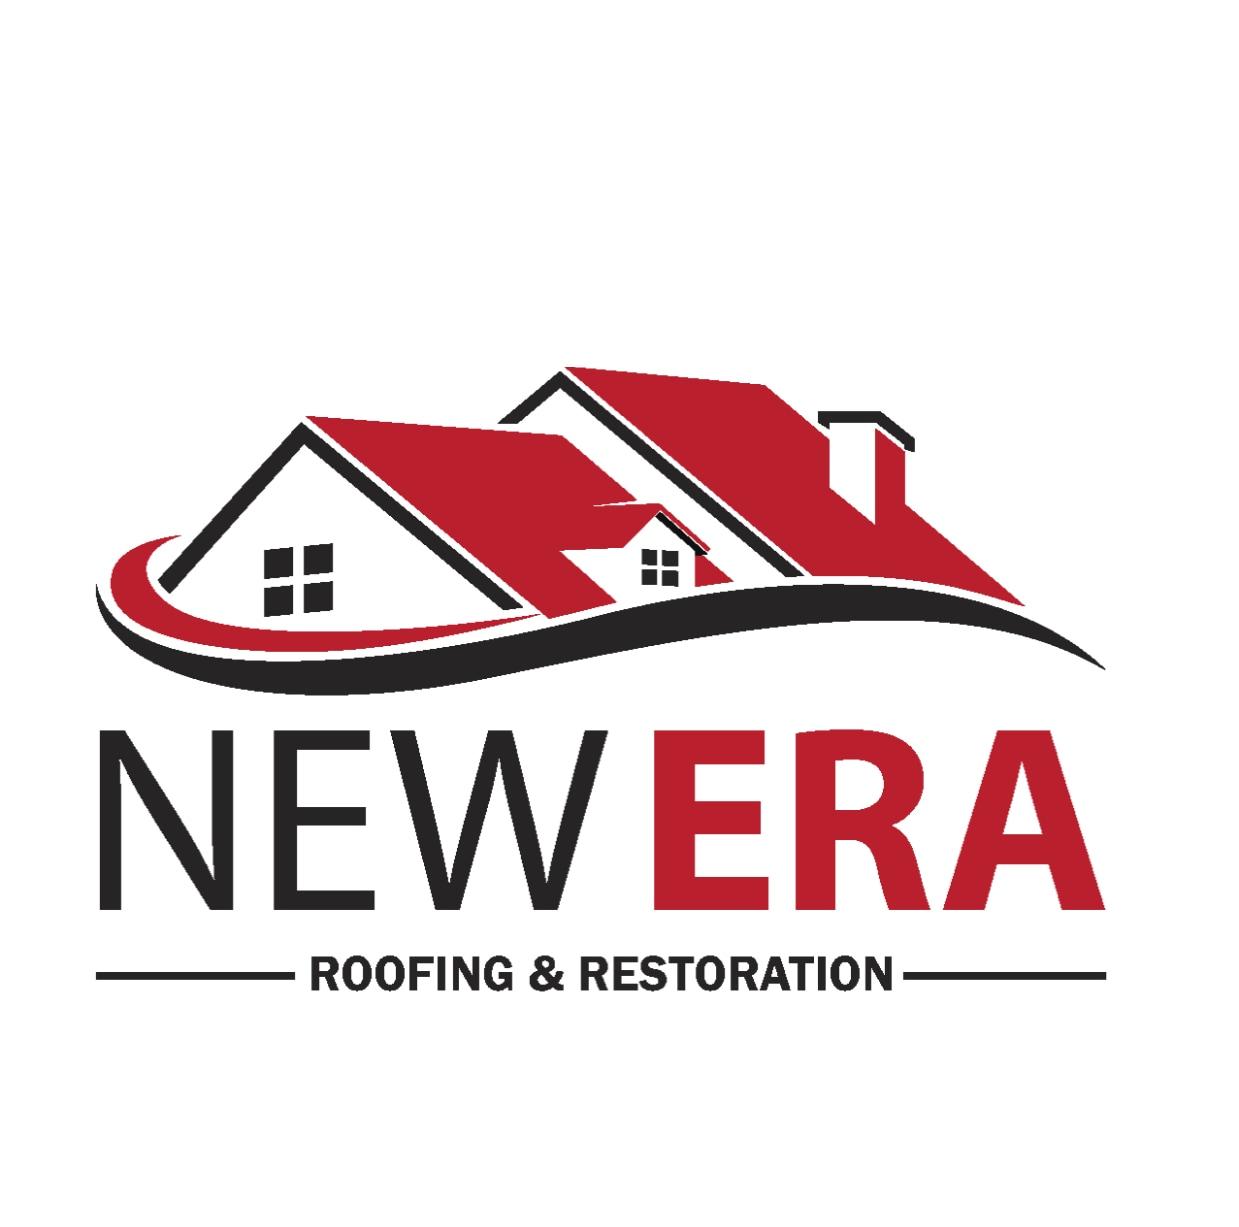 New Era Roofing Restoration Reviews Denver Co Angie S List